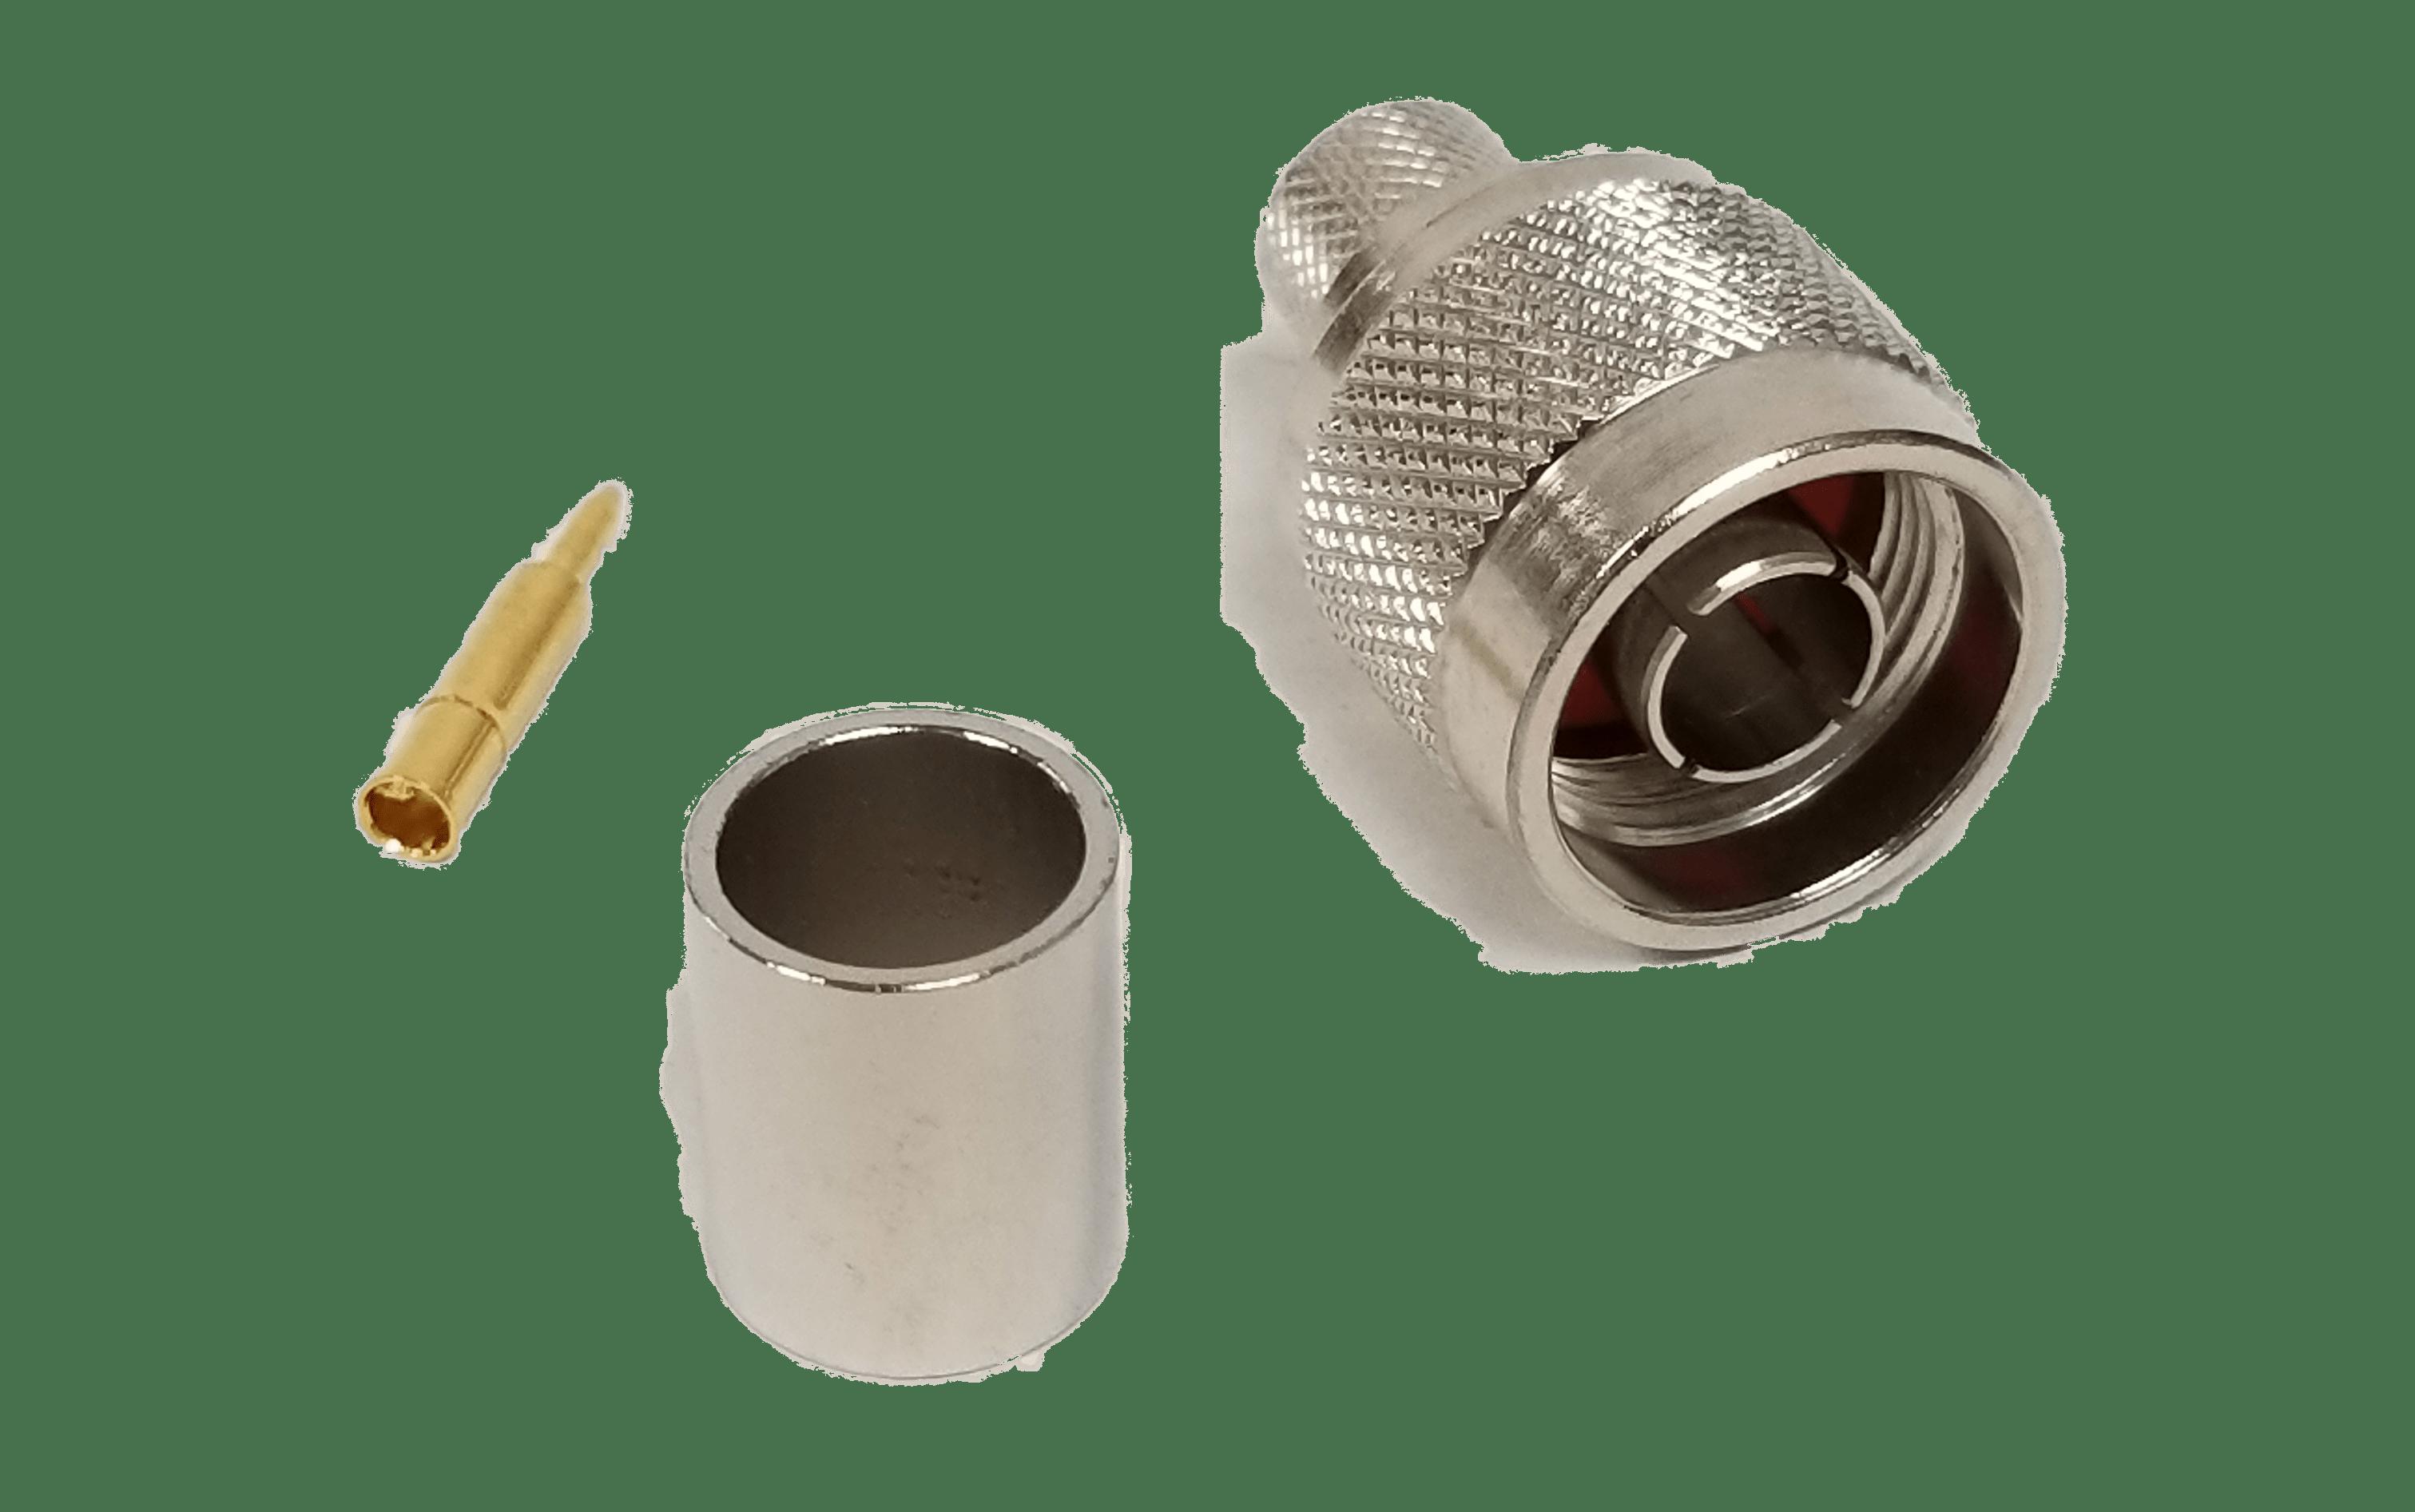 N019913C - ProComm Male N Connector For 9913 Belden Coax